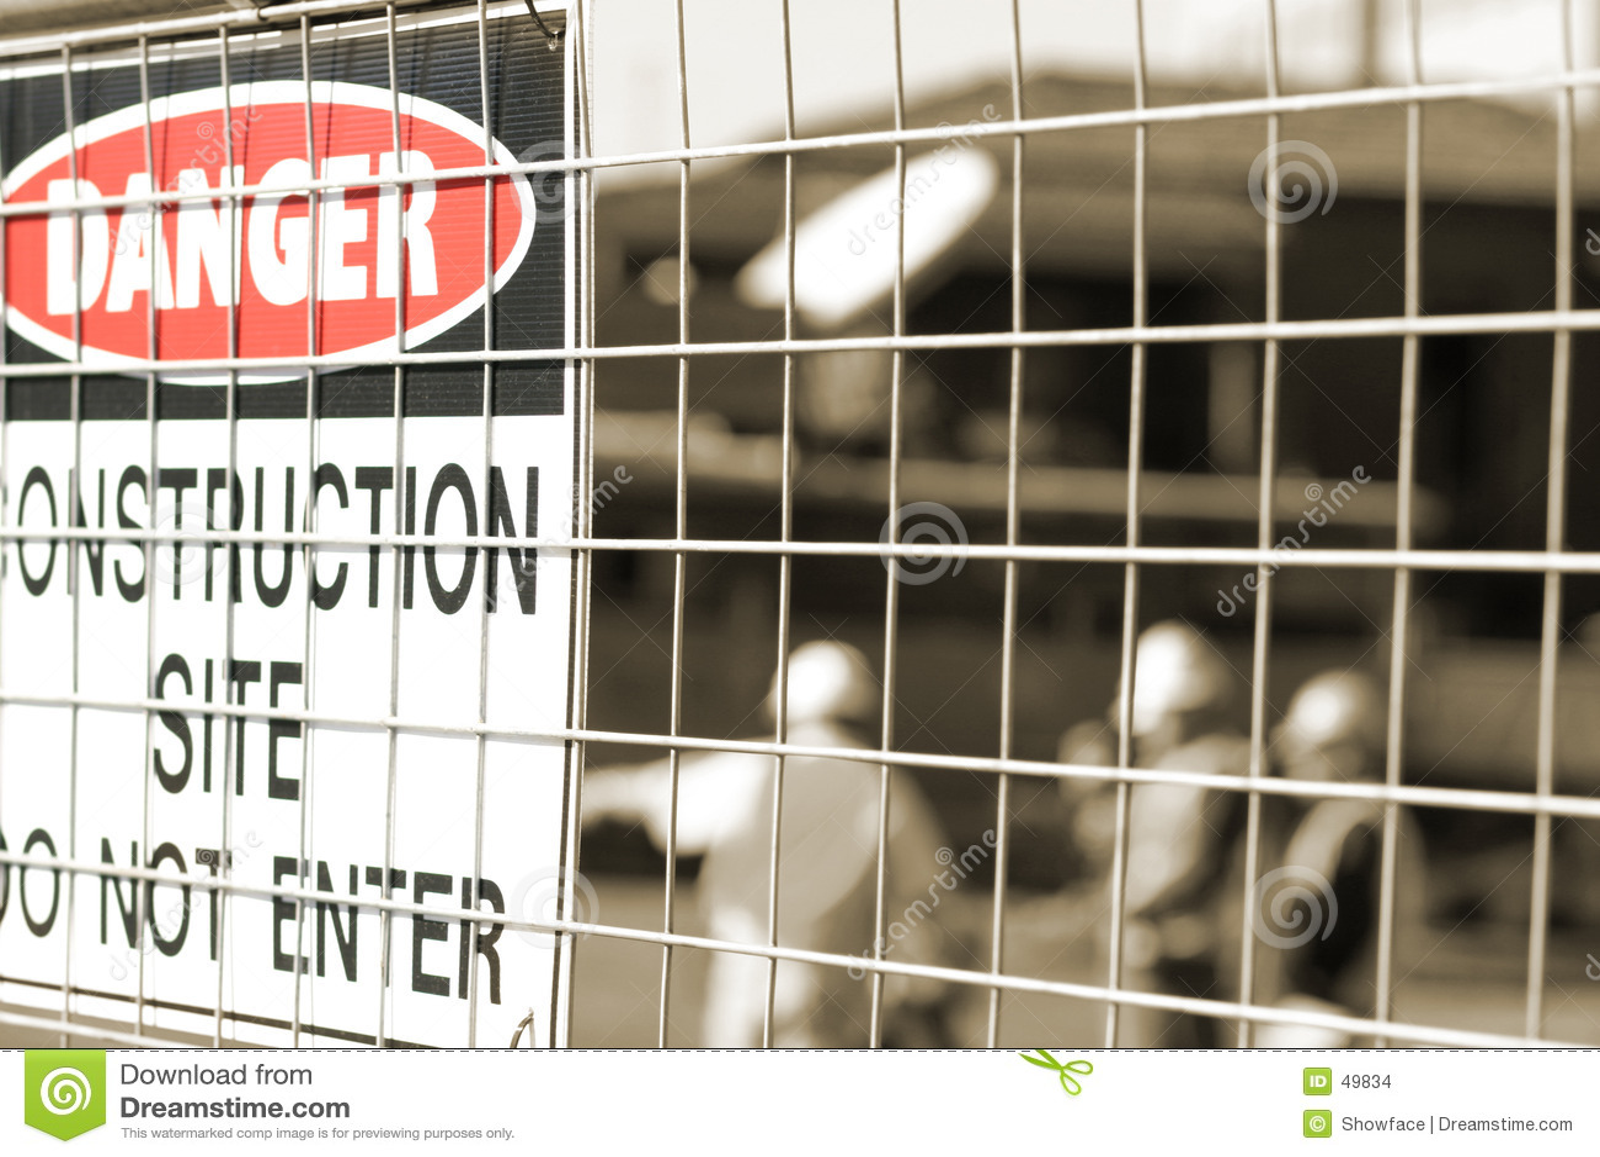 Download 建筑标志工作者 库存照片. 图片 包括有 建筑, 工作员, 电汇, 危险, 禁止, 工作, 站点, 符号, 布琼布拉 - 49834